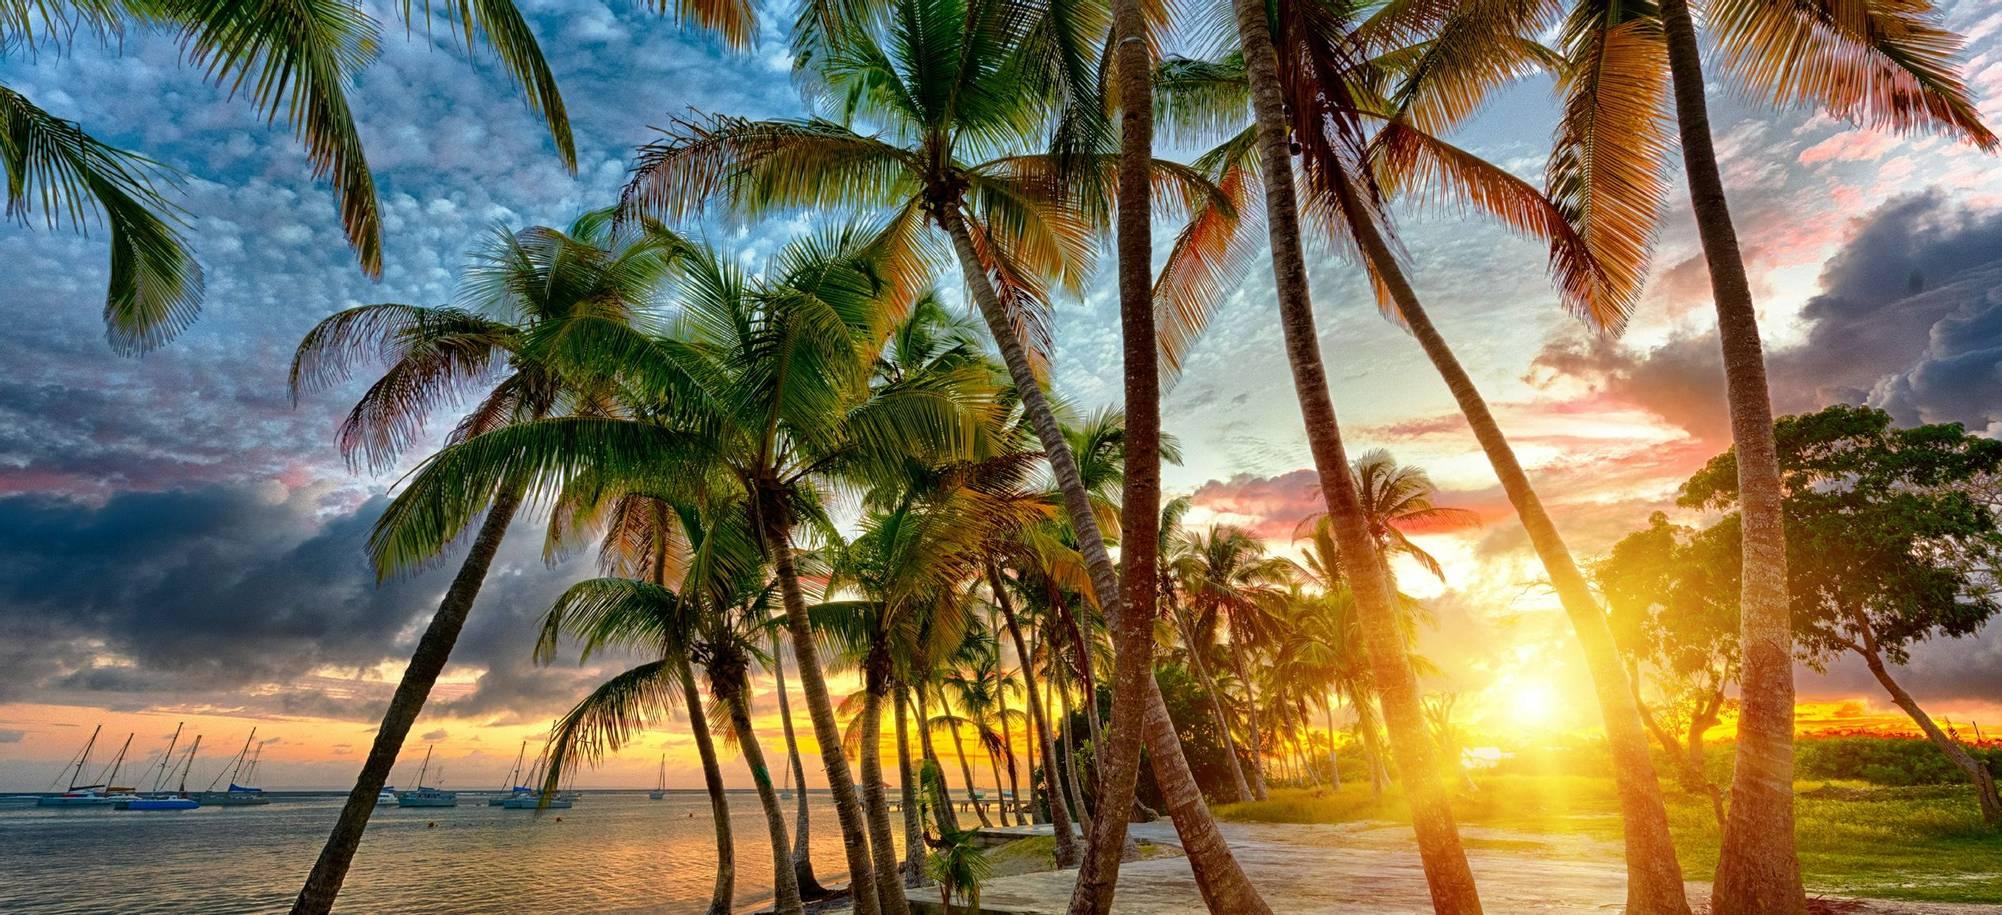 Itinerary Desktop - Day 7 - Guadeloupe v2.jpg